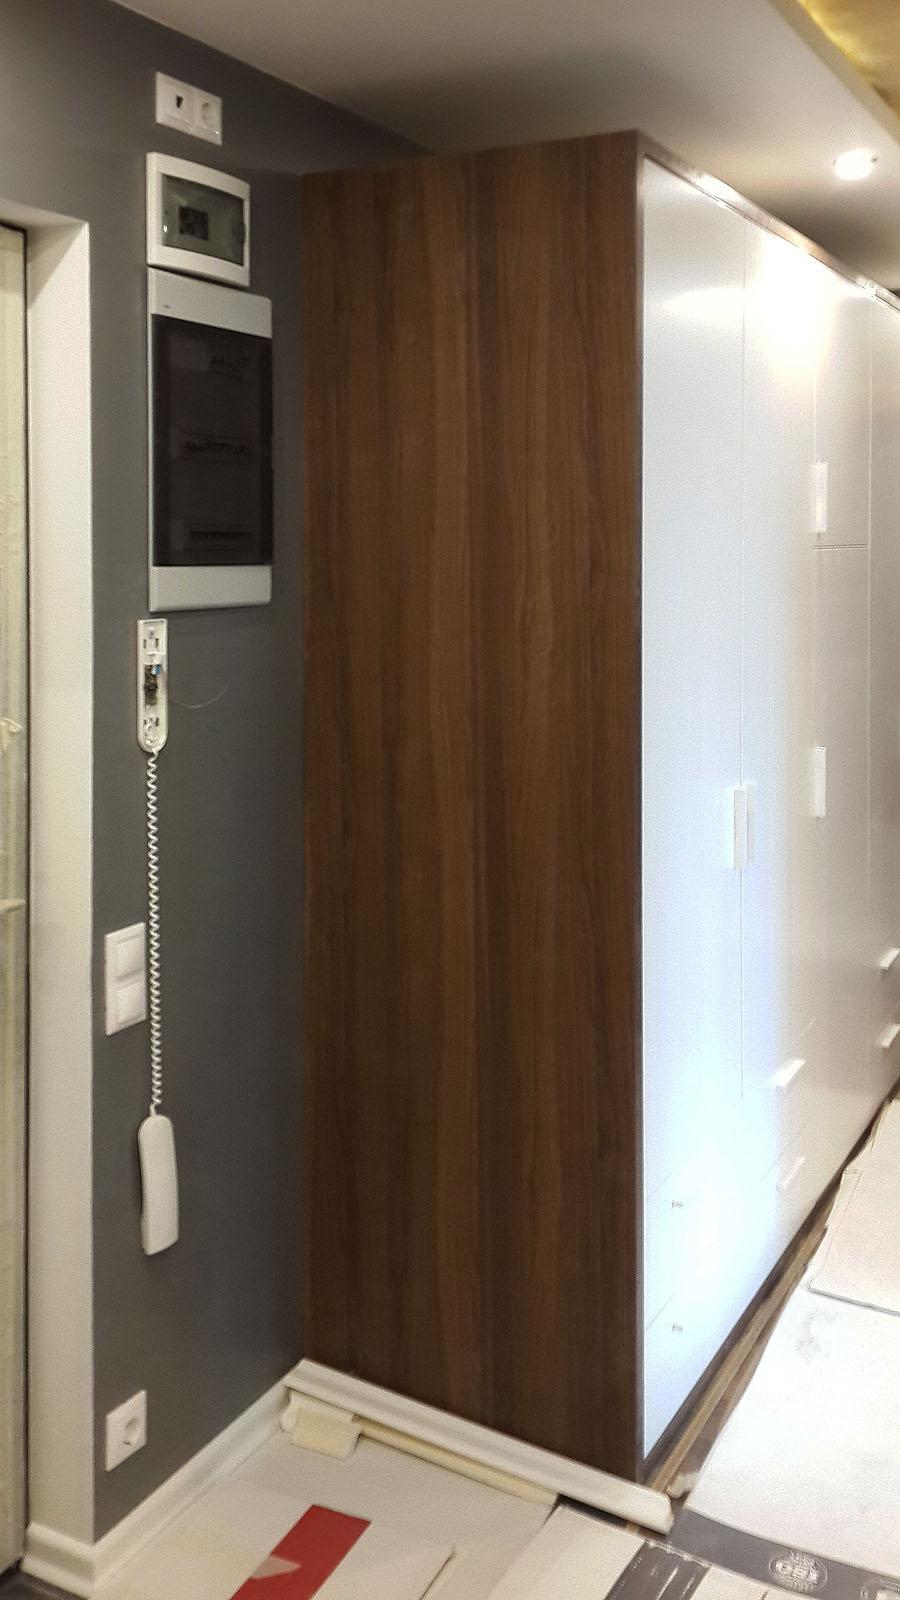 Ремонт квартир и офисов Бригада отделочников Москва